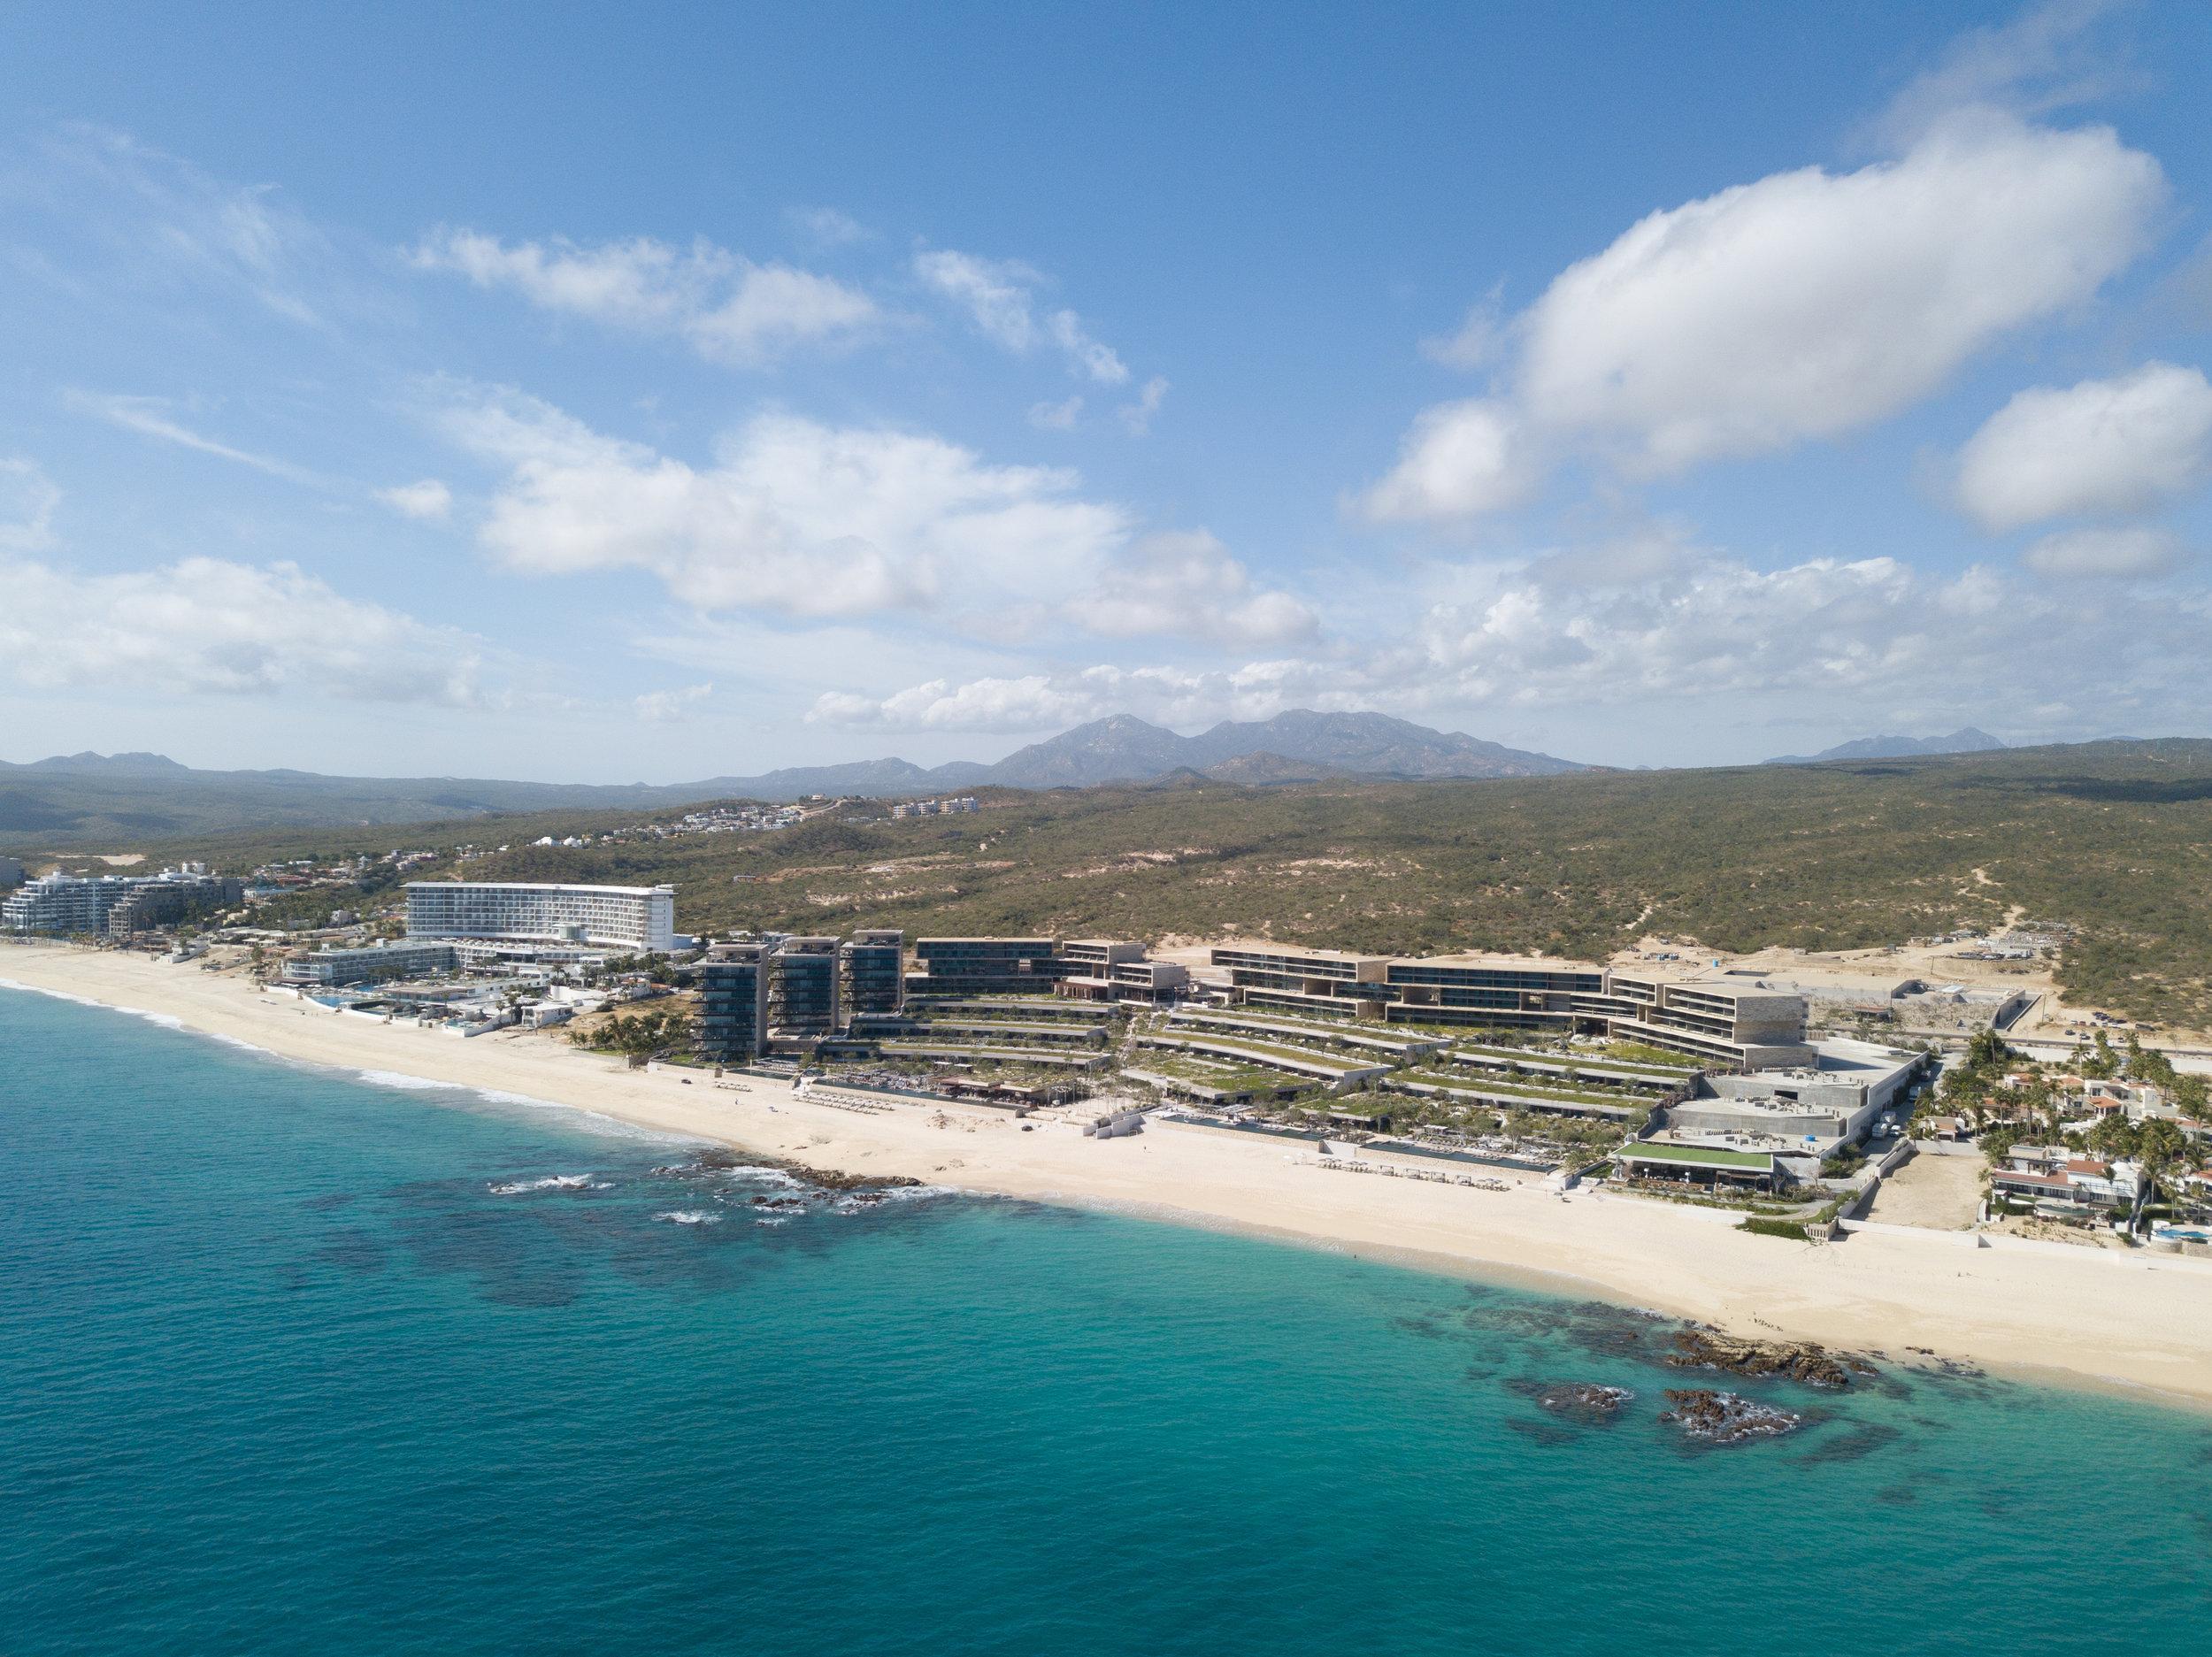 solaz los cabos resort, solaz los cabos resort cabo, solaz los cabos resort cabo san lucas, solaz los cabos resort cabo san lucas mexico